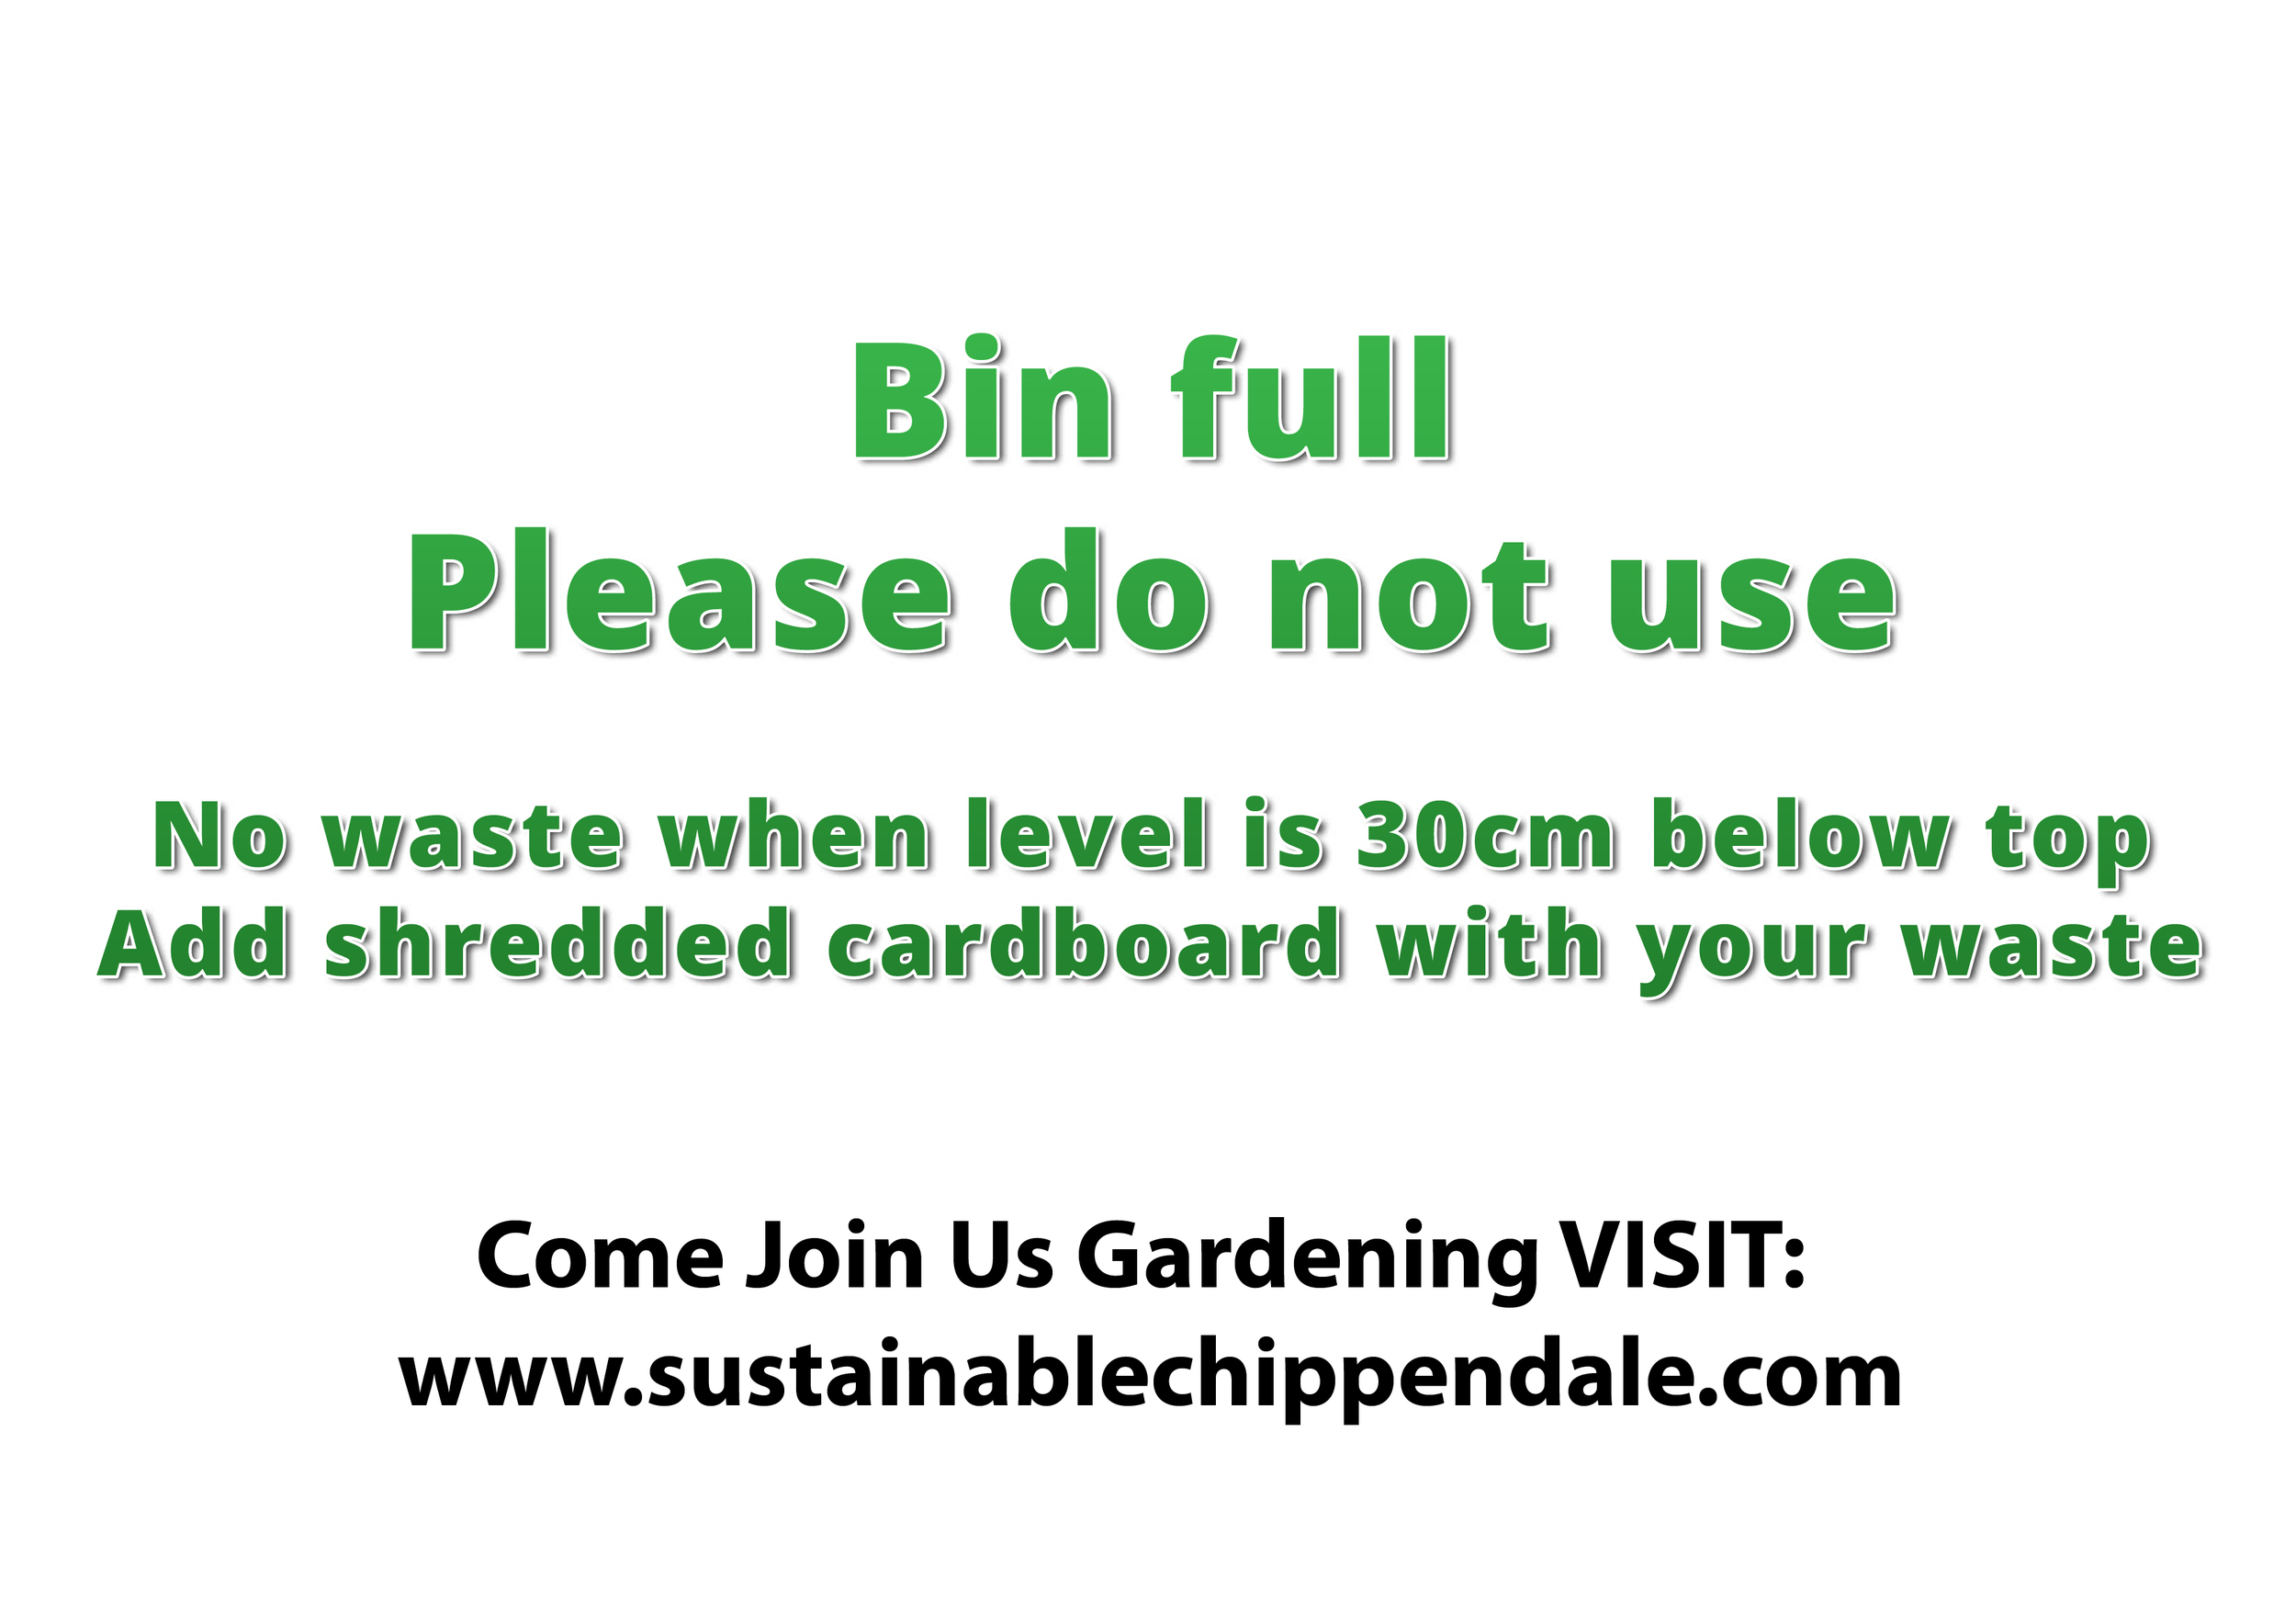 Sustainable Chippendale - Aerobin full sign.jpg